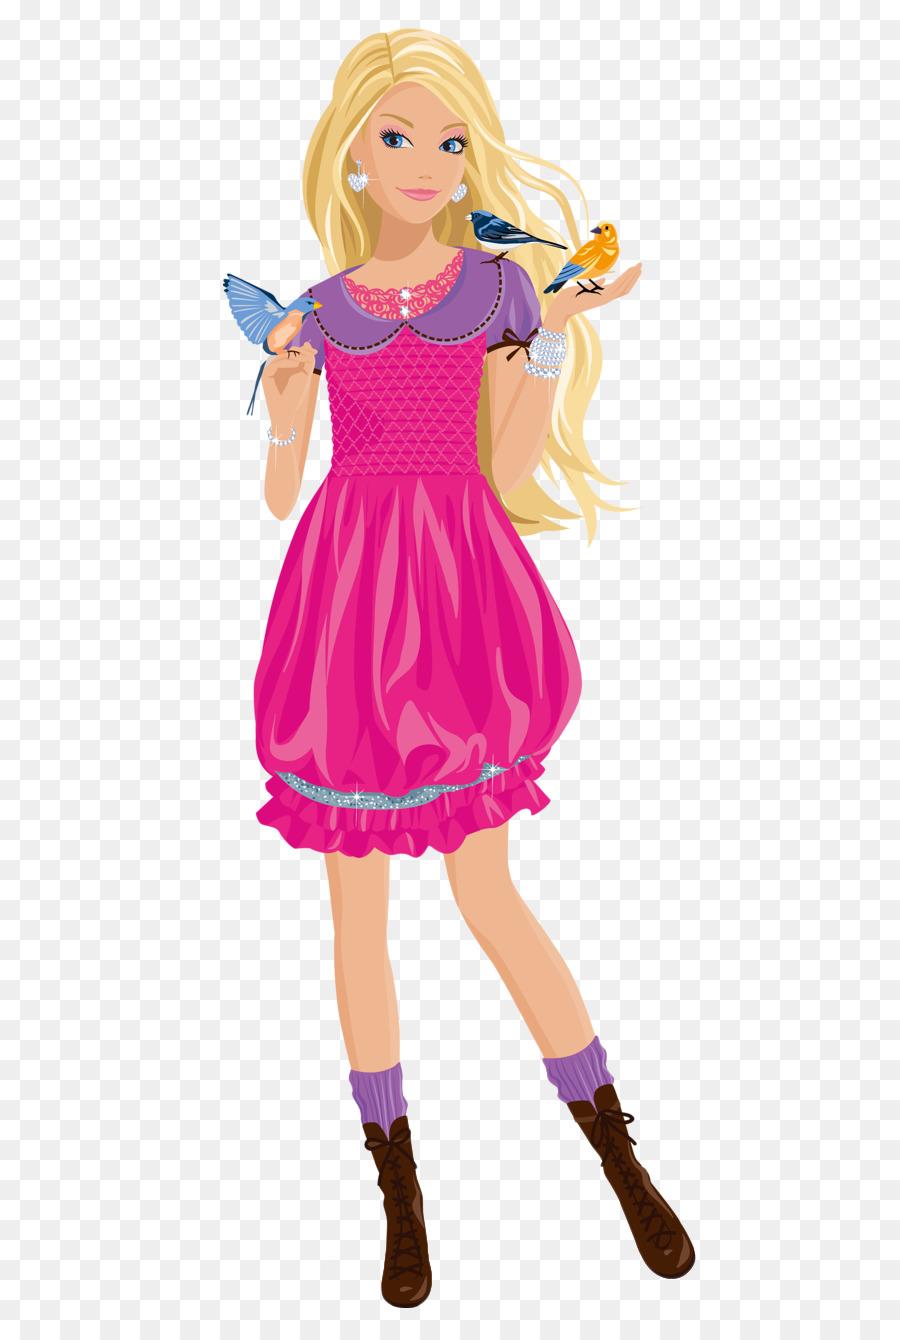 Free content clip art. Barbie clipart character